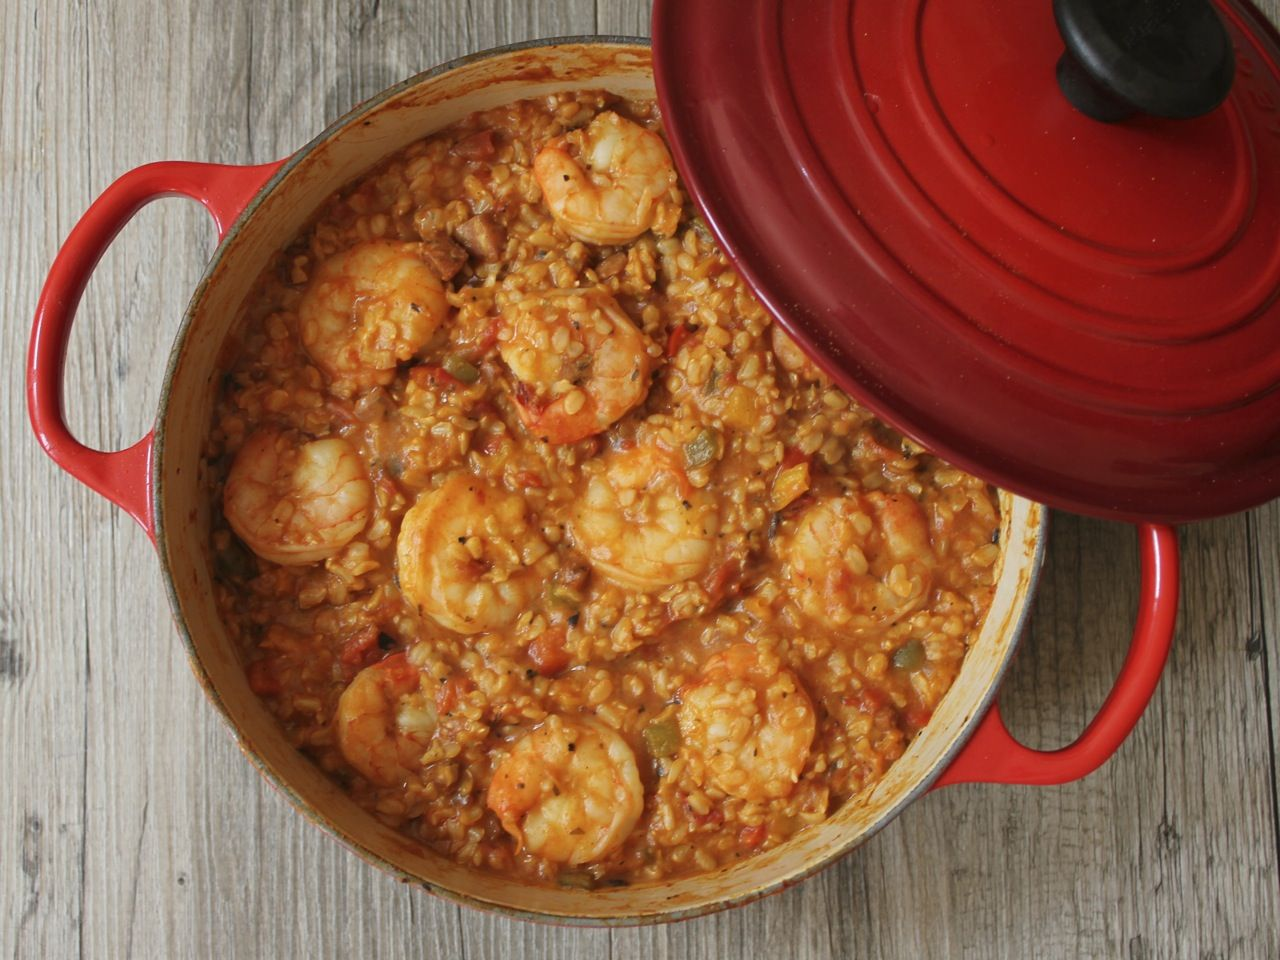 Shrimp chicken andouille jambalaya recipe